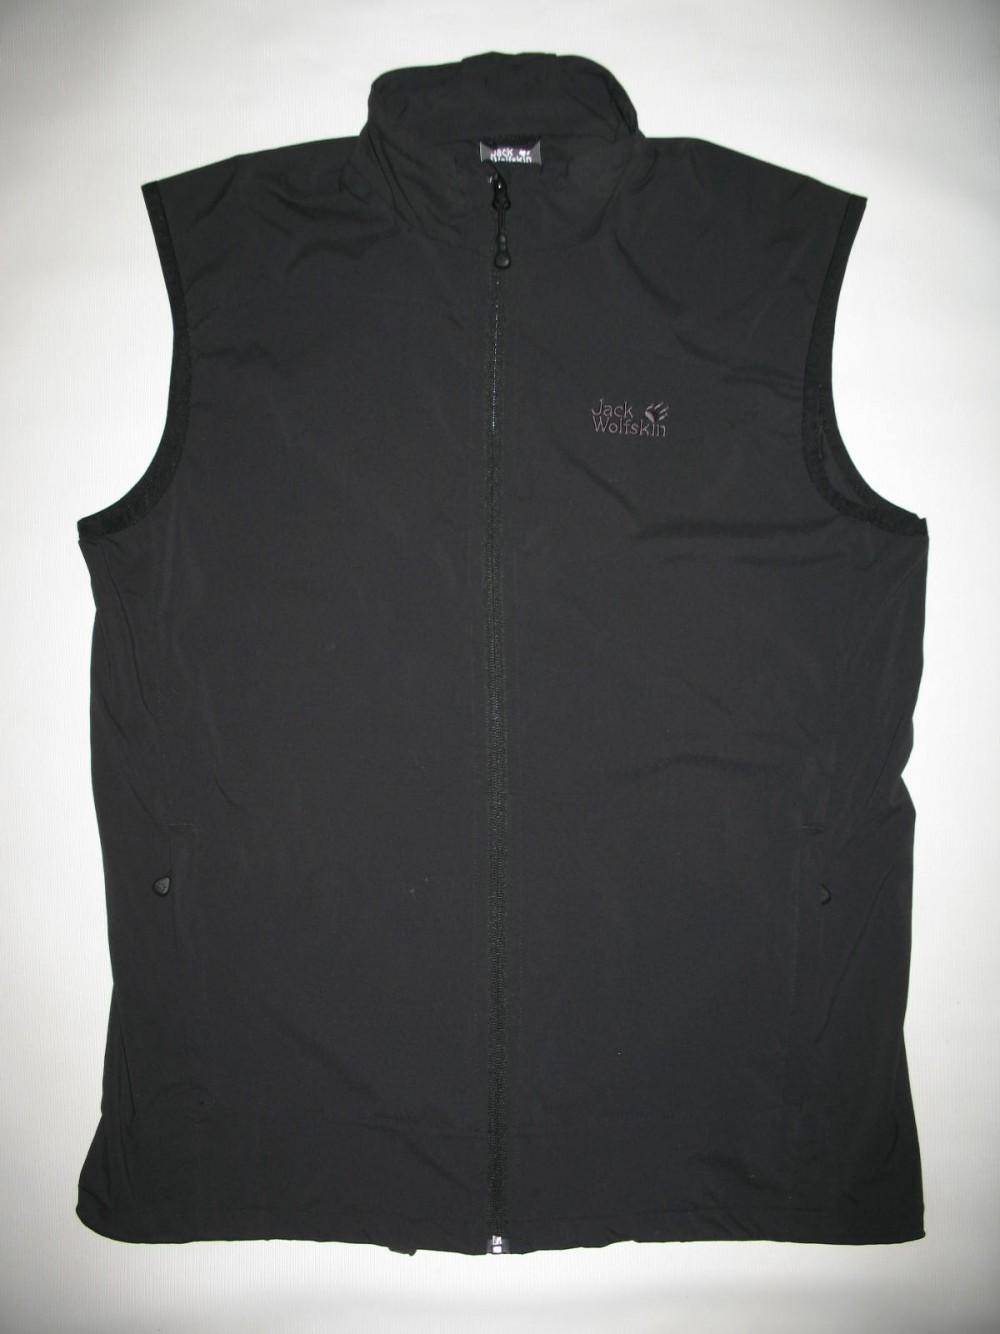 Жилет JACK WOLFSKIN activate softshell vest (размер XL)* - 1